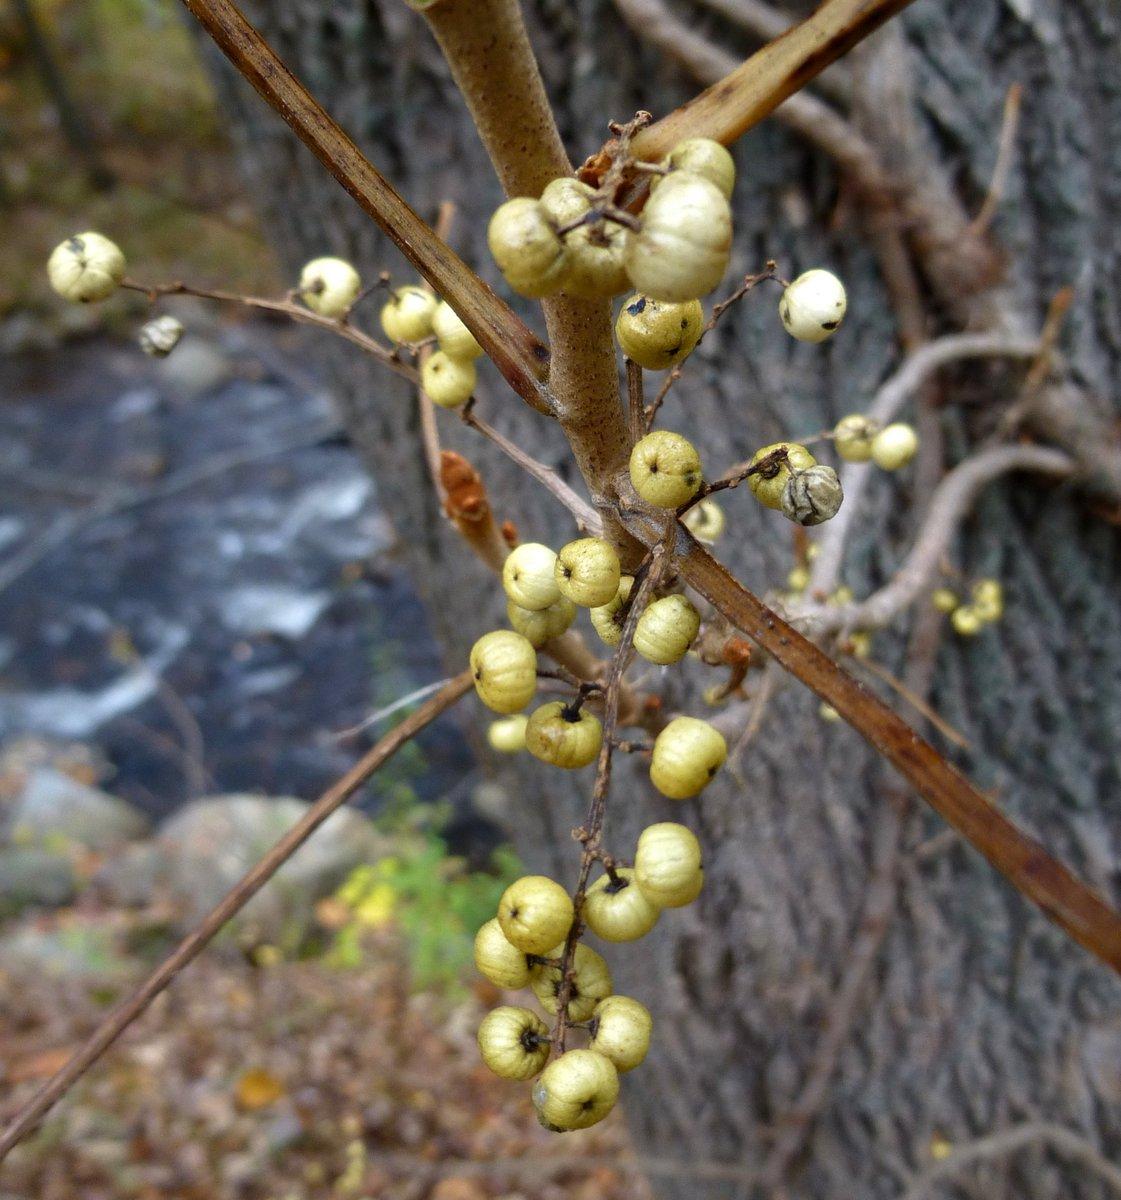 10. Poison Ivy Berries